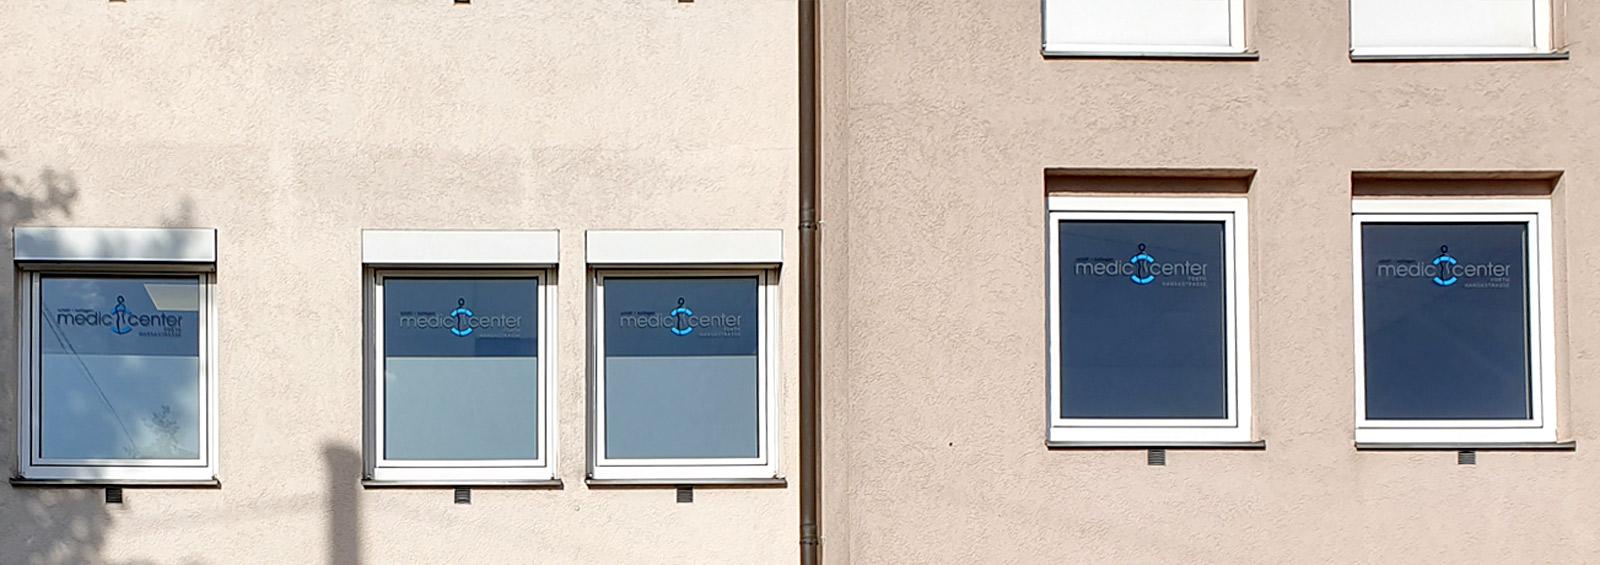 Fenster mit dem Medic Center Logo